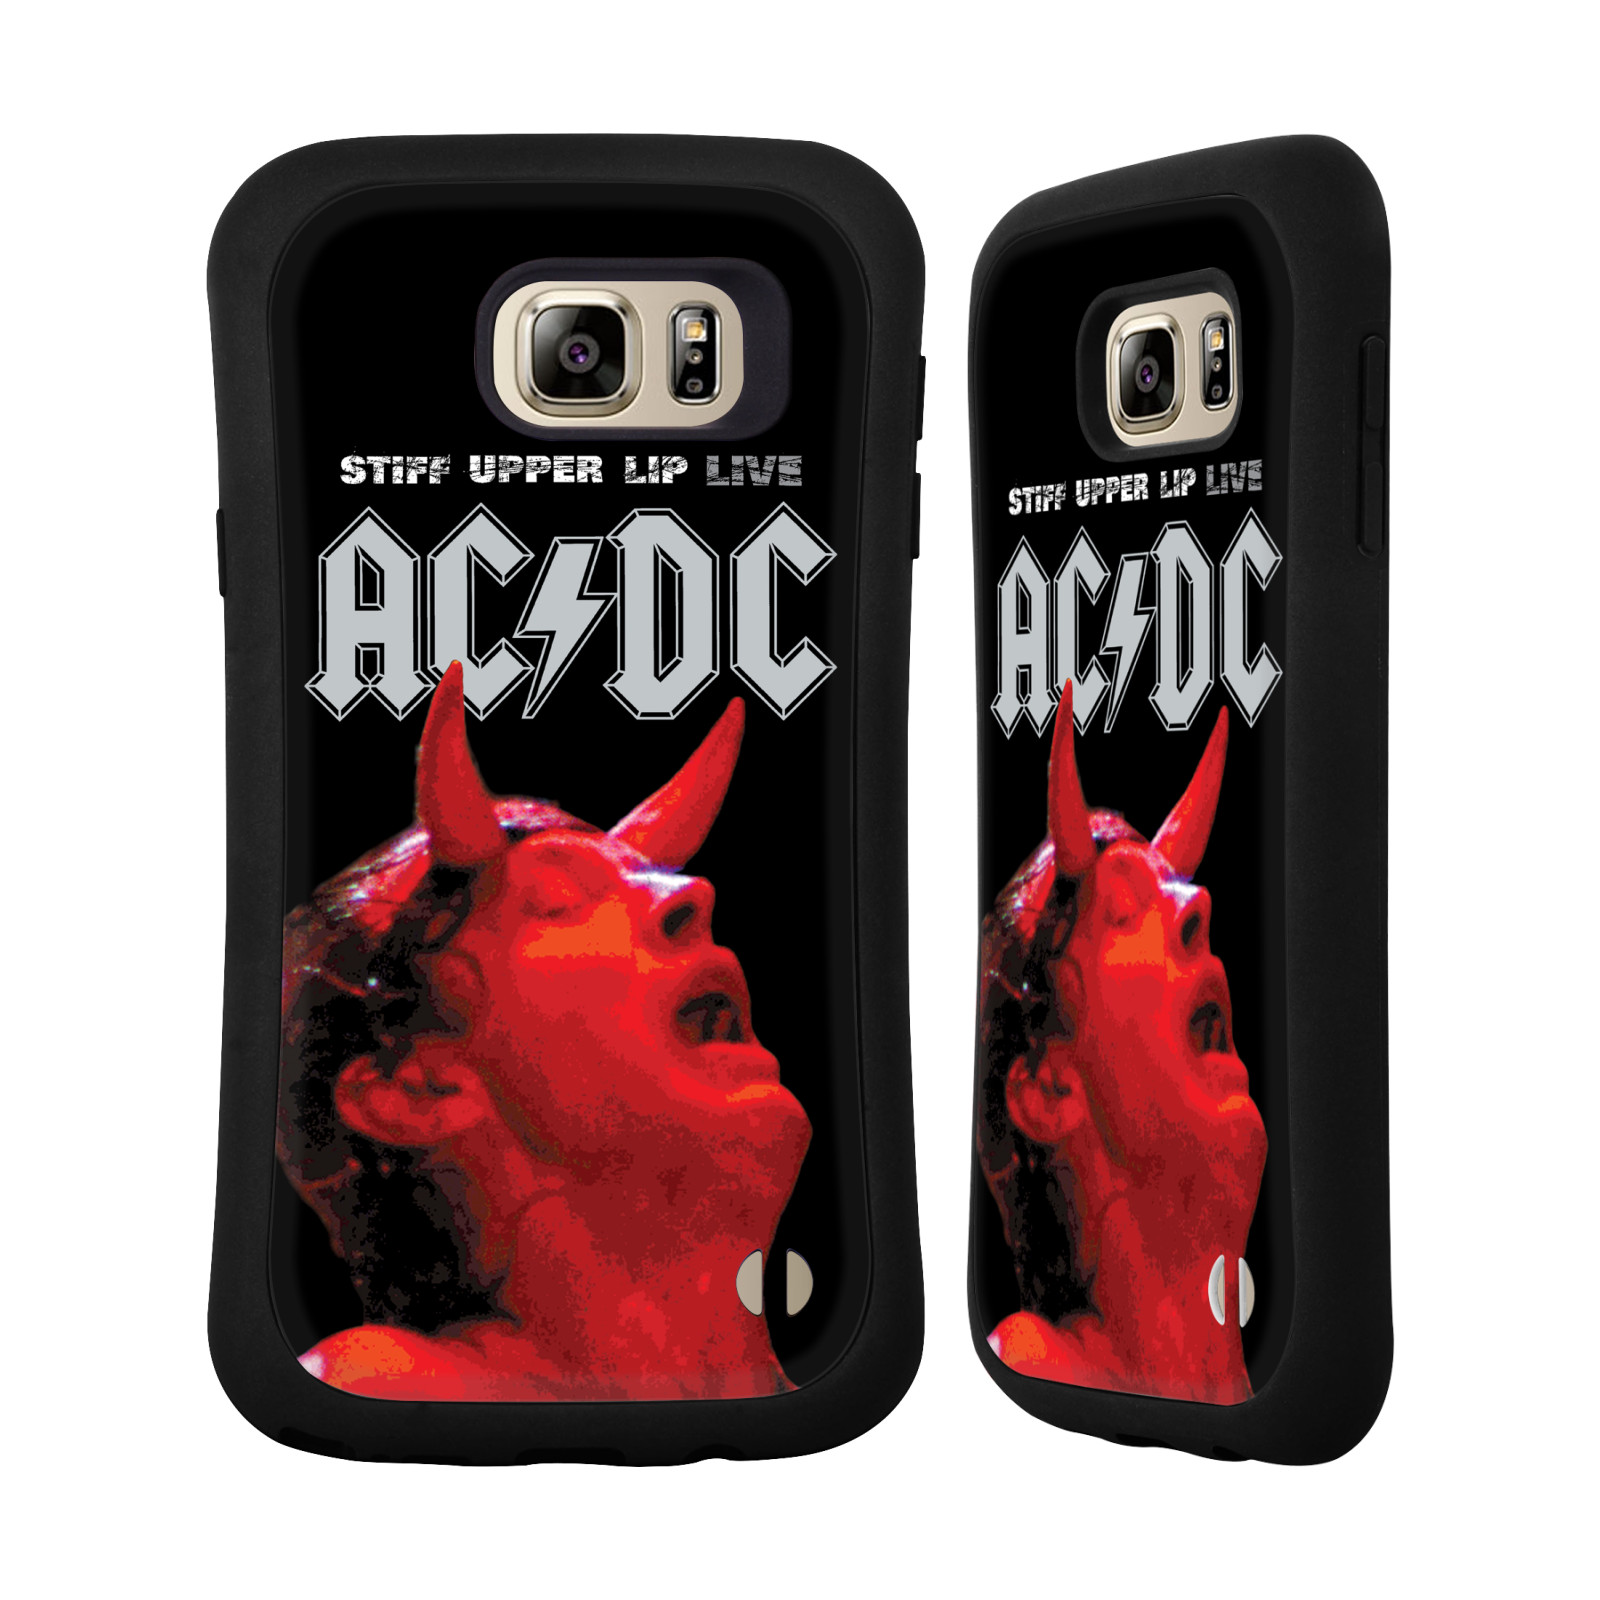 OFFICIAL AC/DC ACDC ALBUM ART HYBRID CASE FOR SAMSUNG PHONES